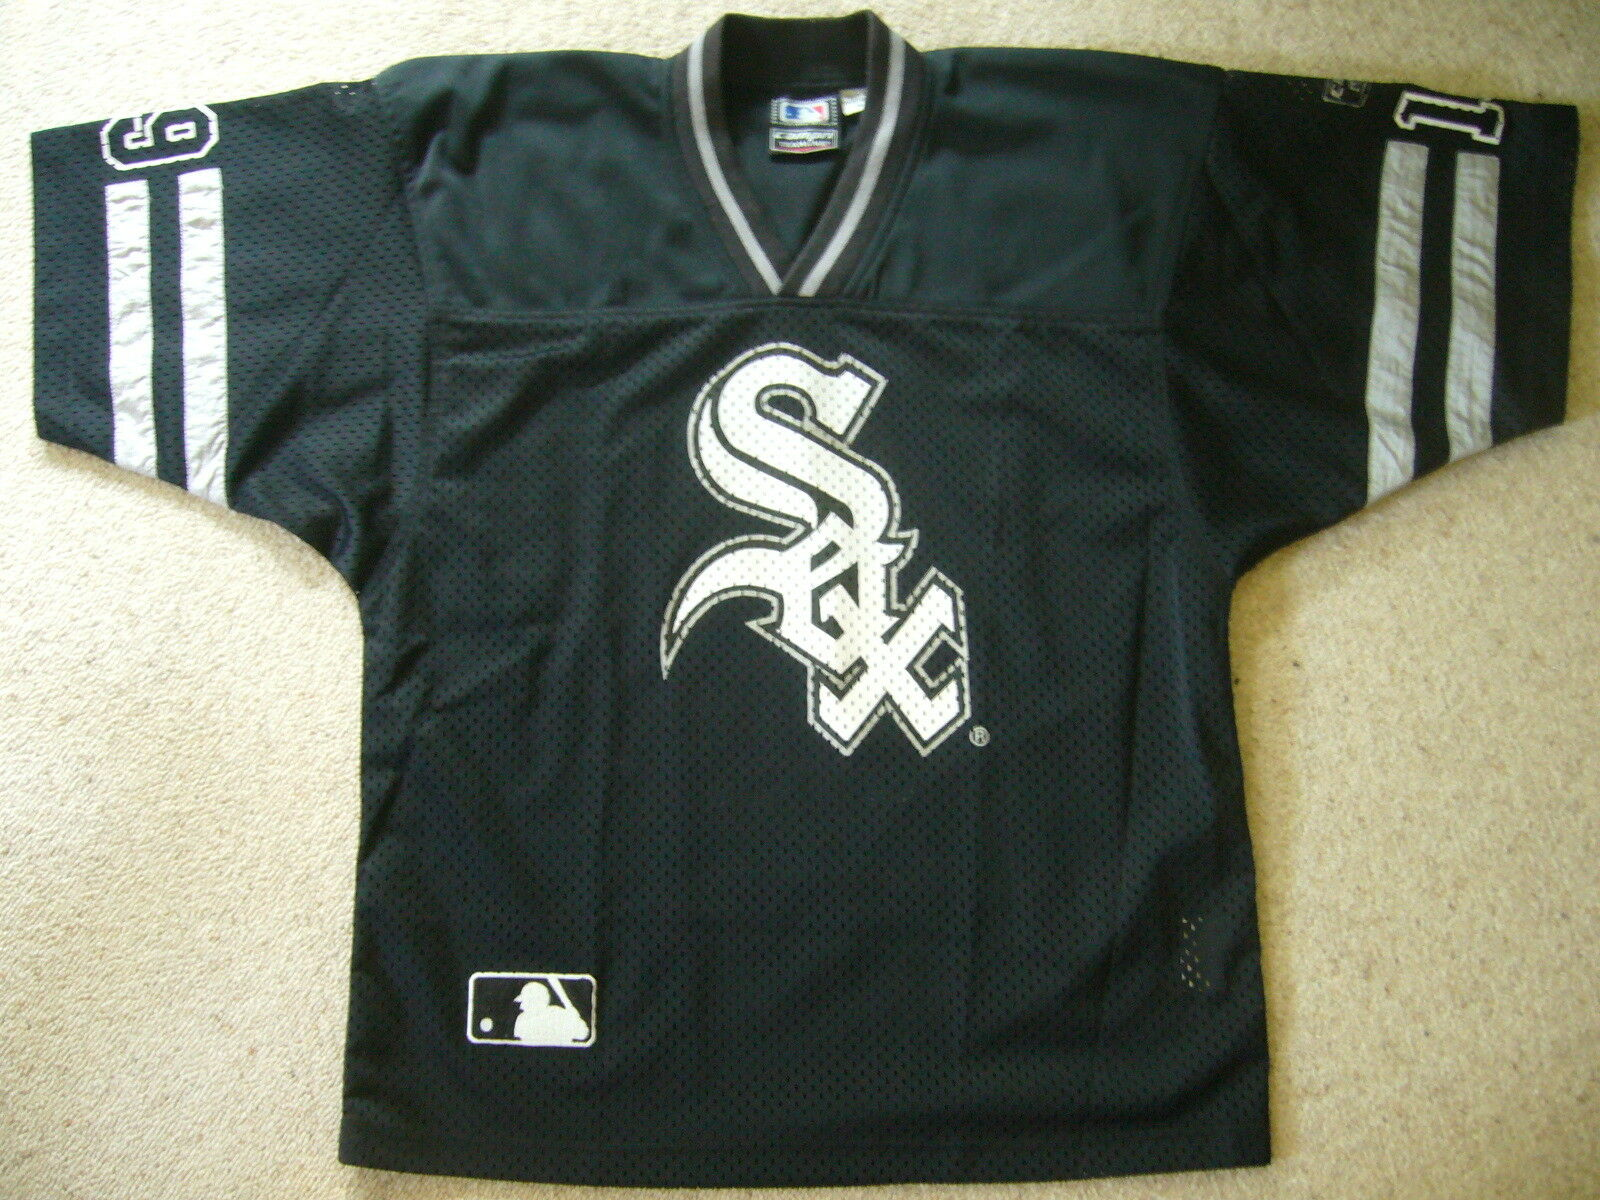 Baseball Shirt   Trikot MLB Weiß SOX Nr. 19 CAMPRI TEAMLINE schwarz Gr. M